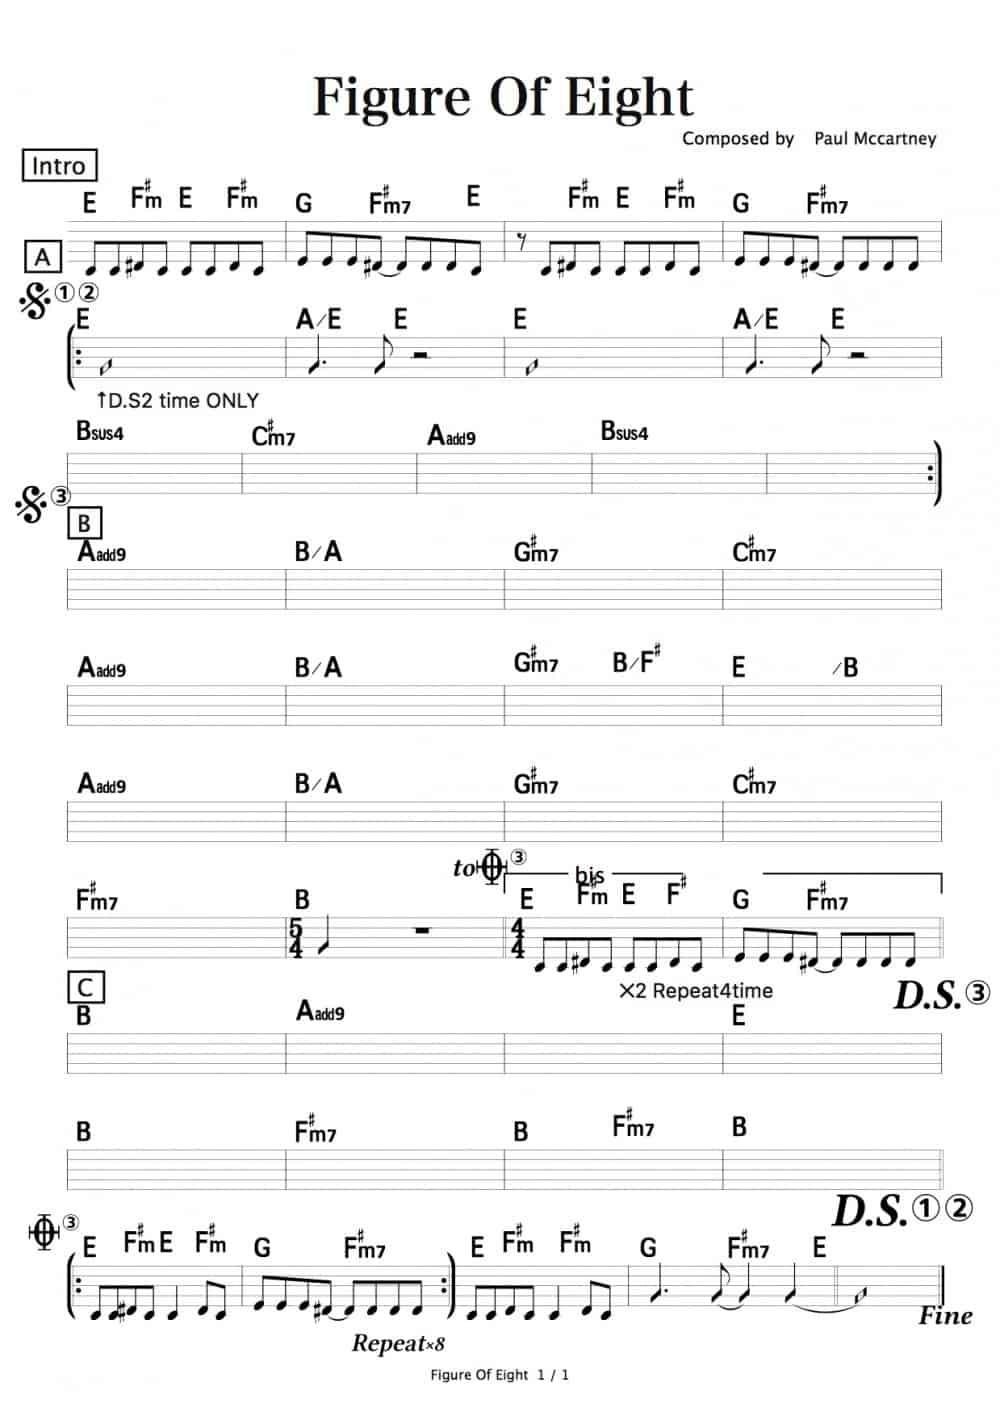 Figure Of Eight(Paul McCartney)マスターリズム譜